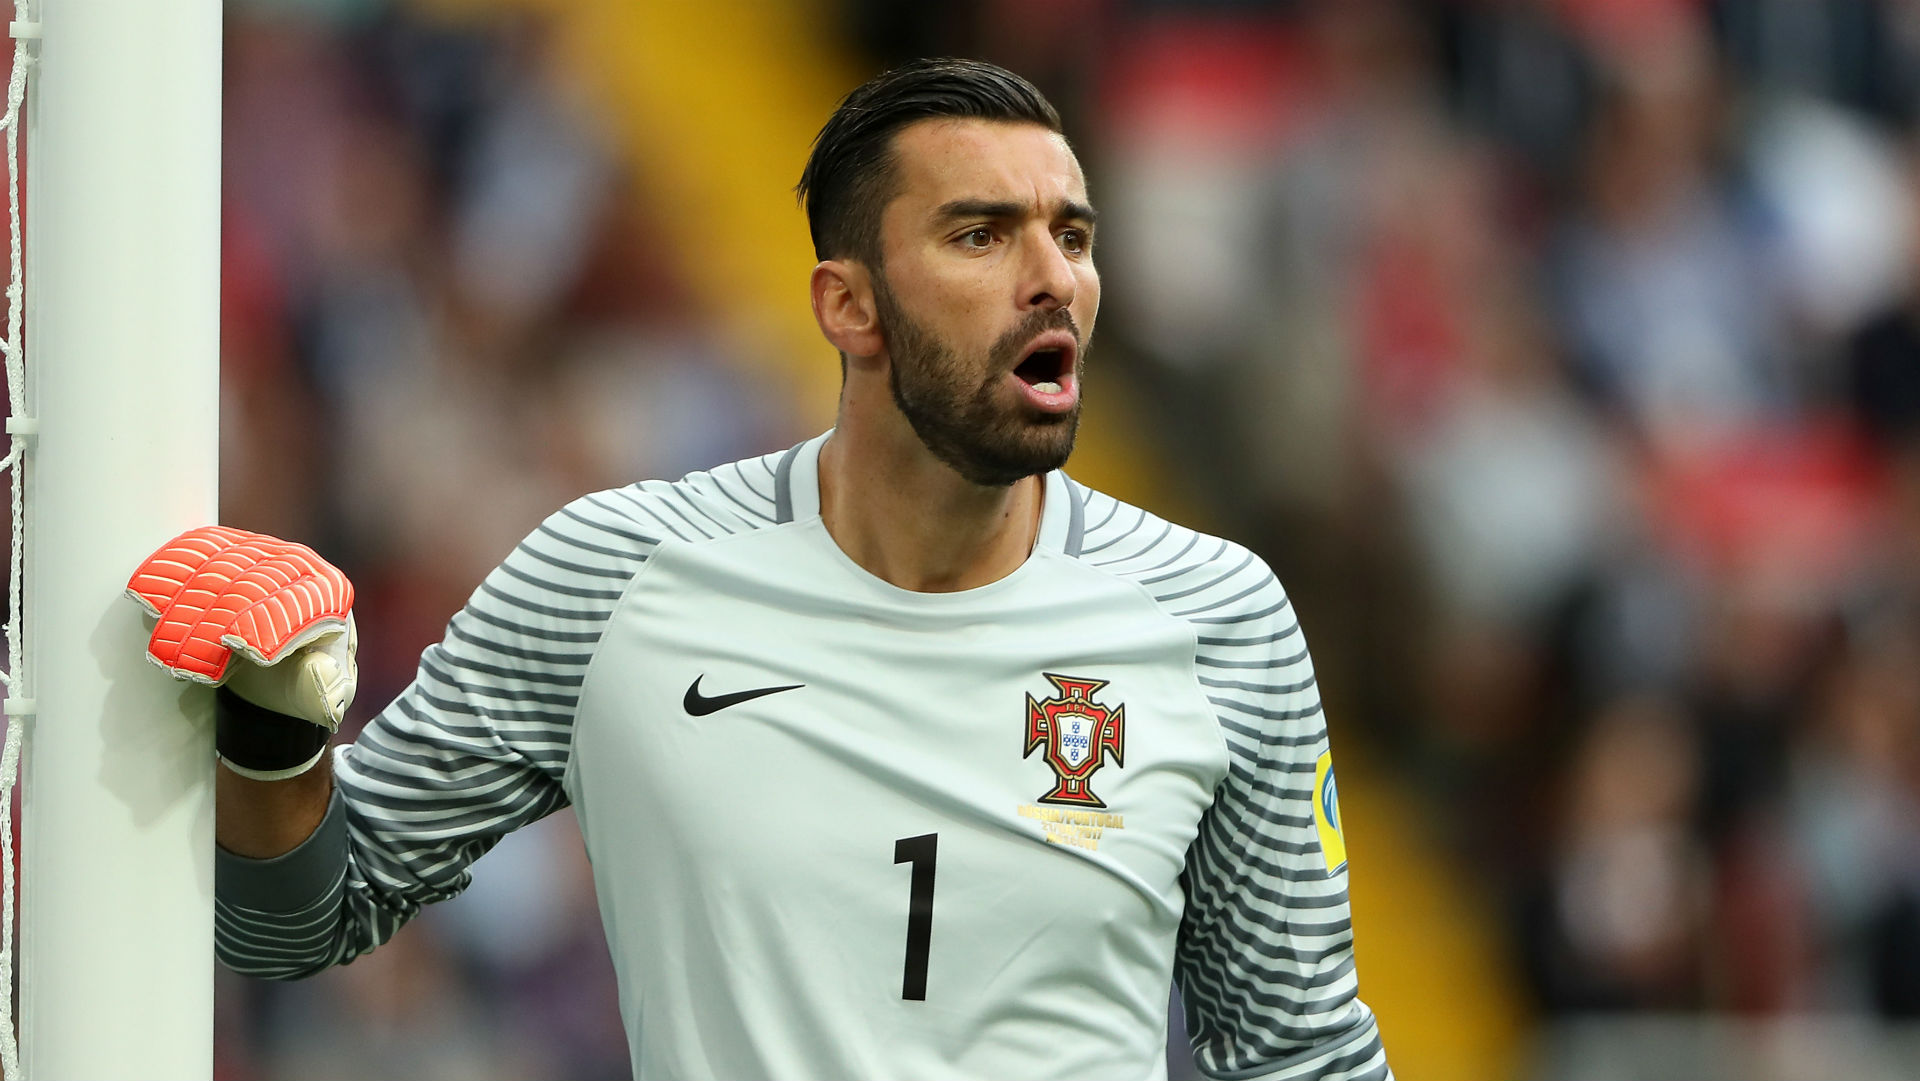 rui patricio portugal 11jaxa37o4vqw1iago23evgy2p - Transfer News: Rui Patricio joins Wolves from Sporting Lisbon